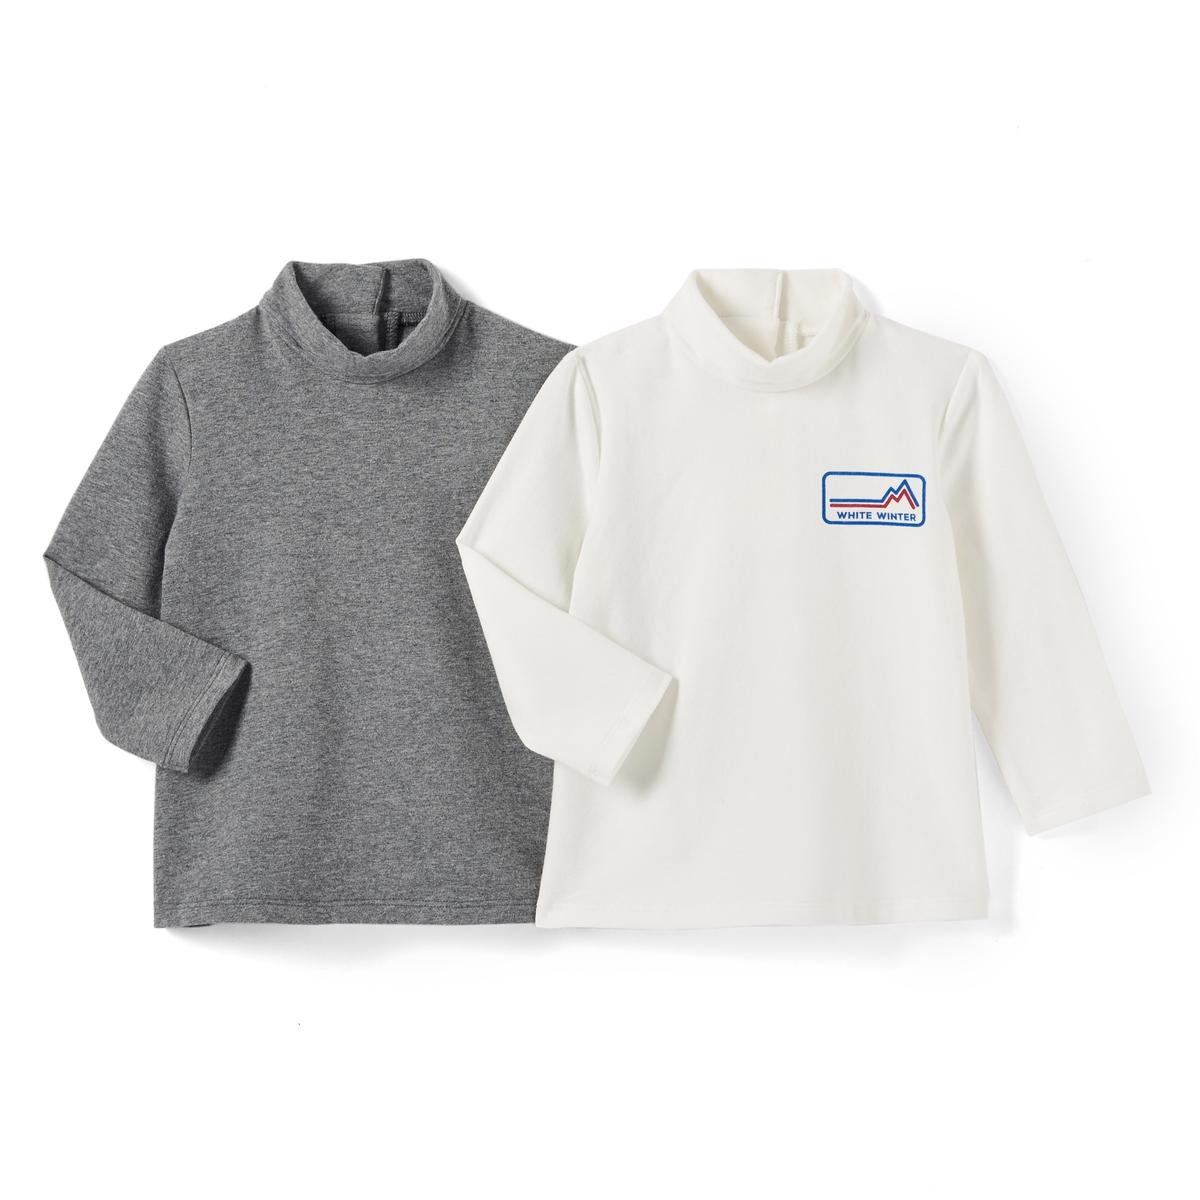 2 футболки-водолазки ML, 1 мес.- 3 лет